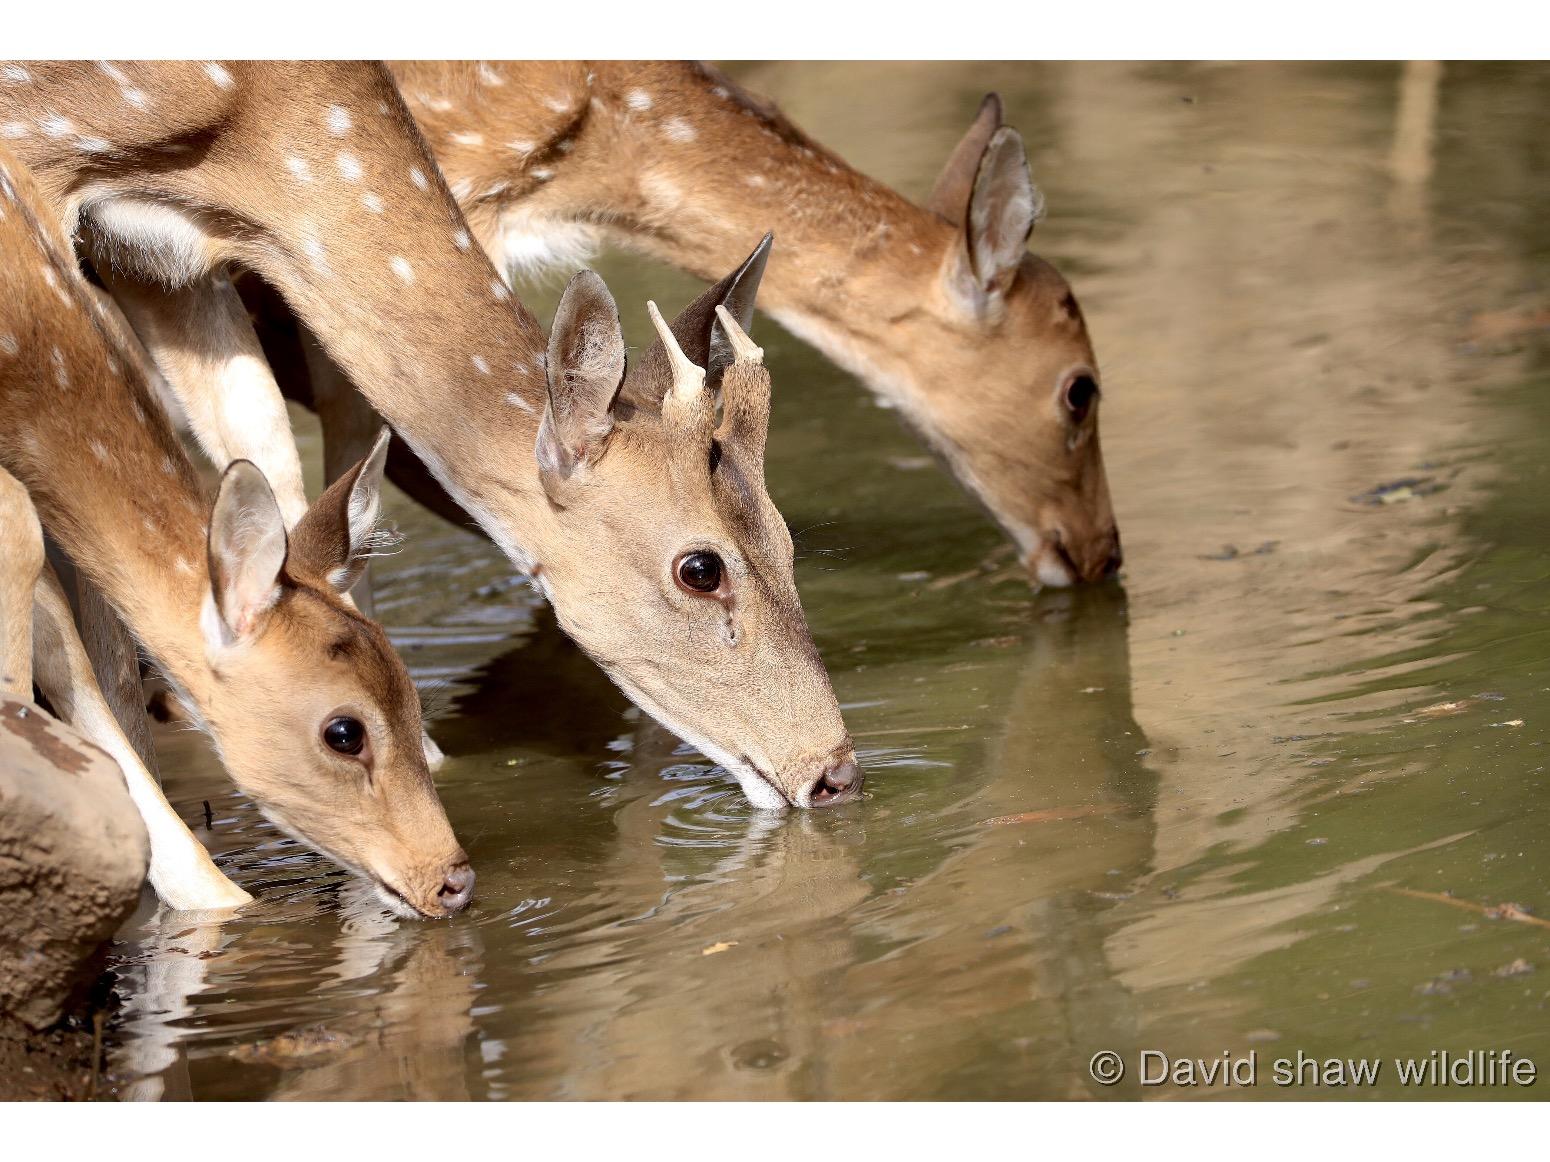 Deer at the water